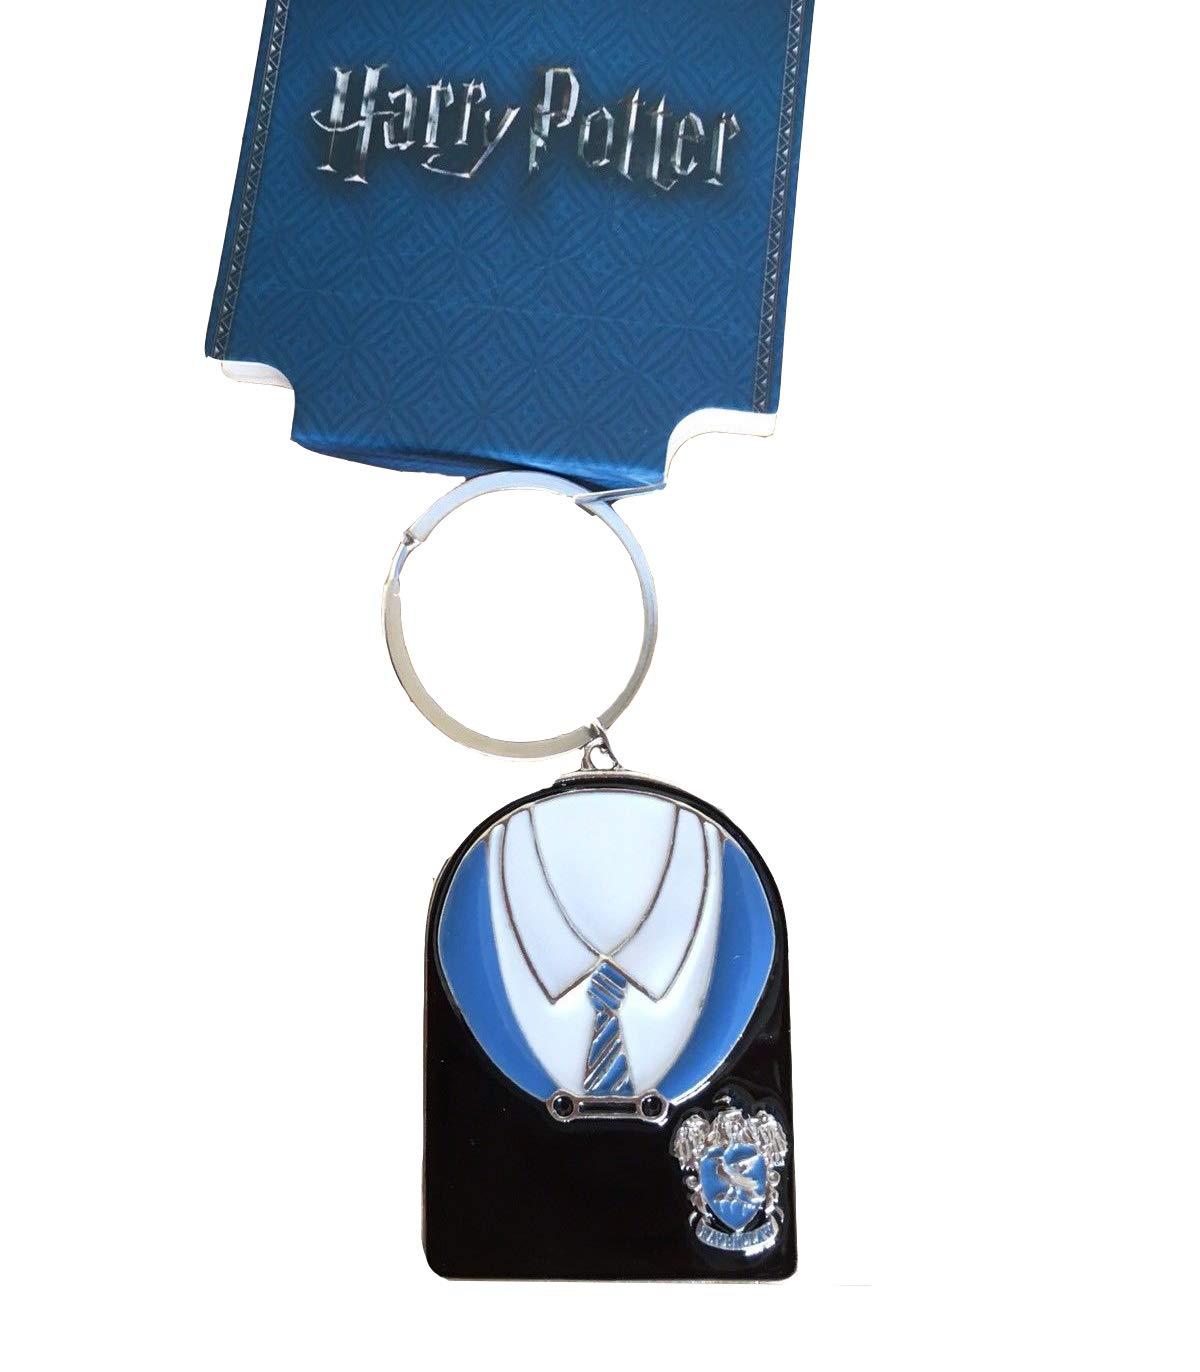 Harry Potter Gryffindor Hufflepuff Ravenclaw Slytherin ...